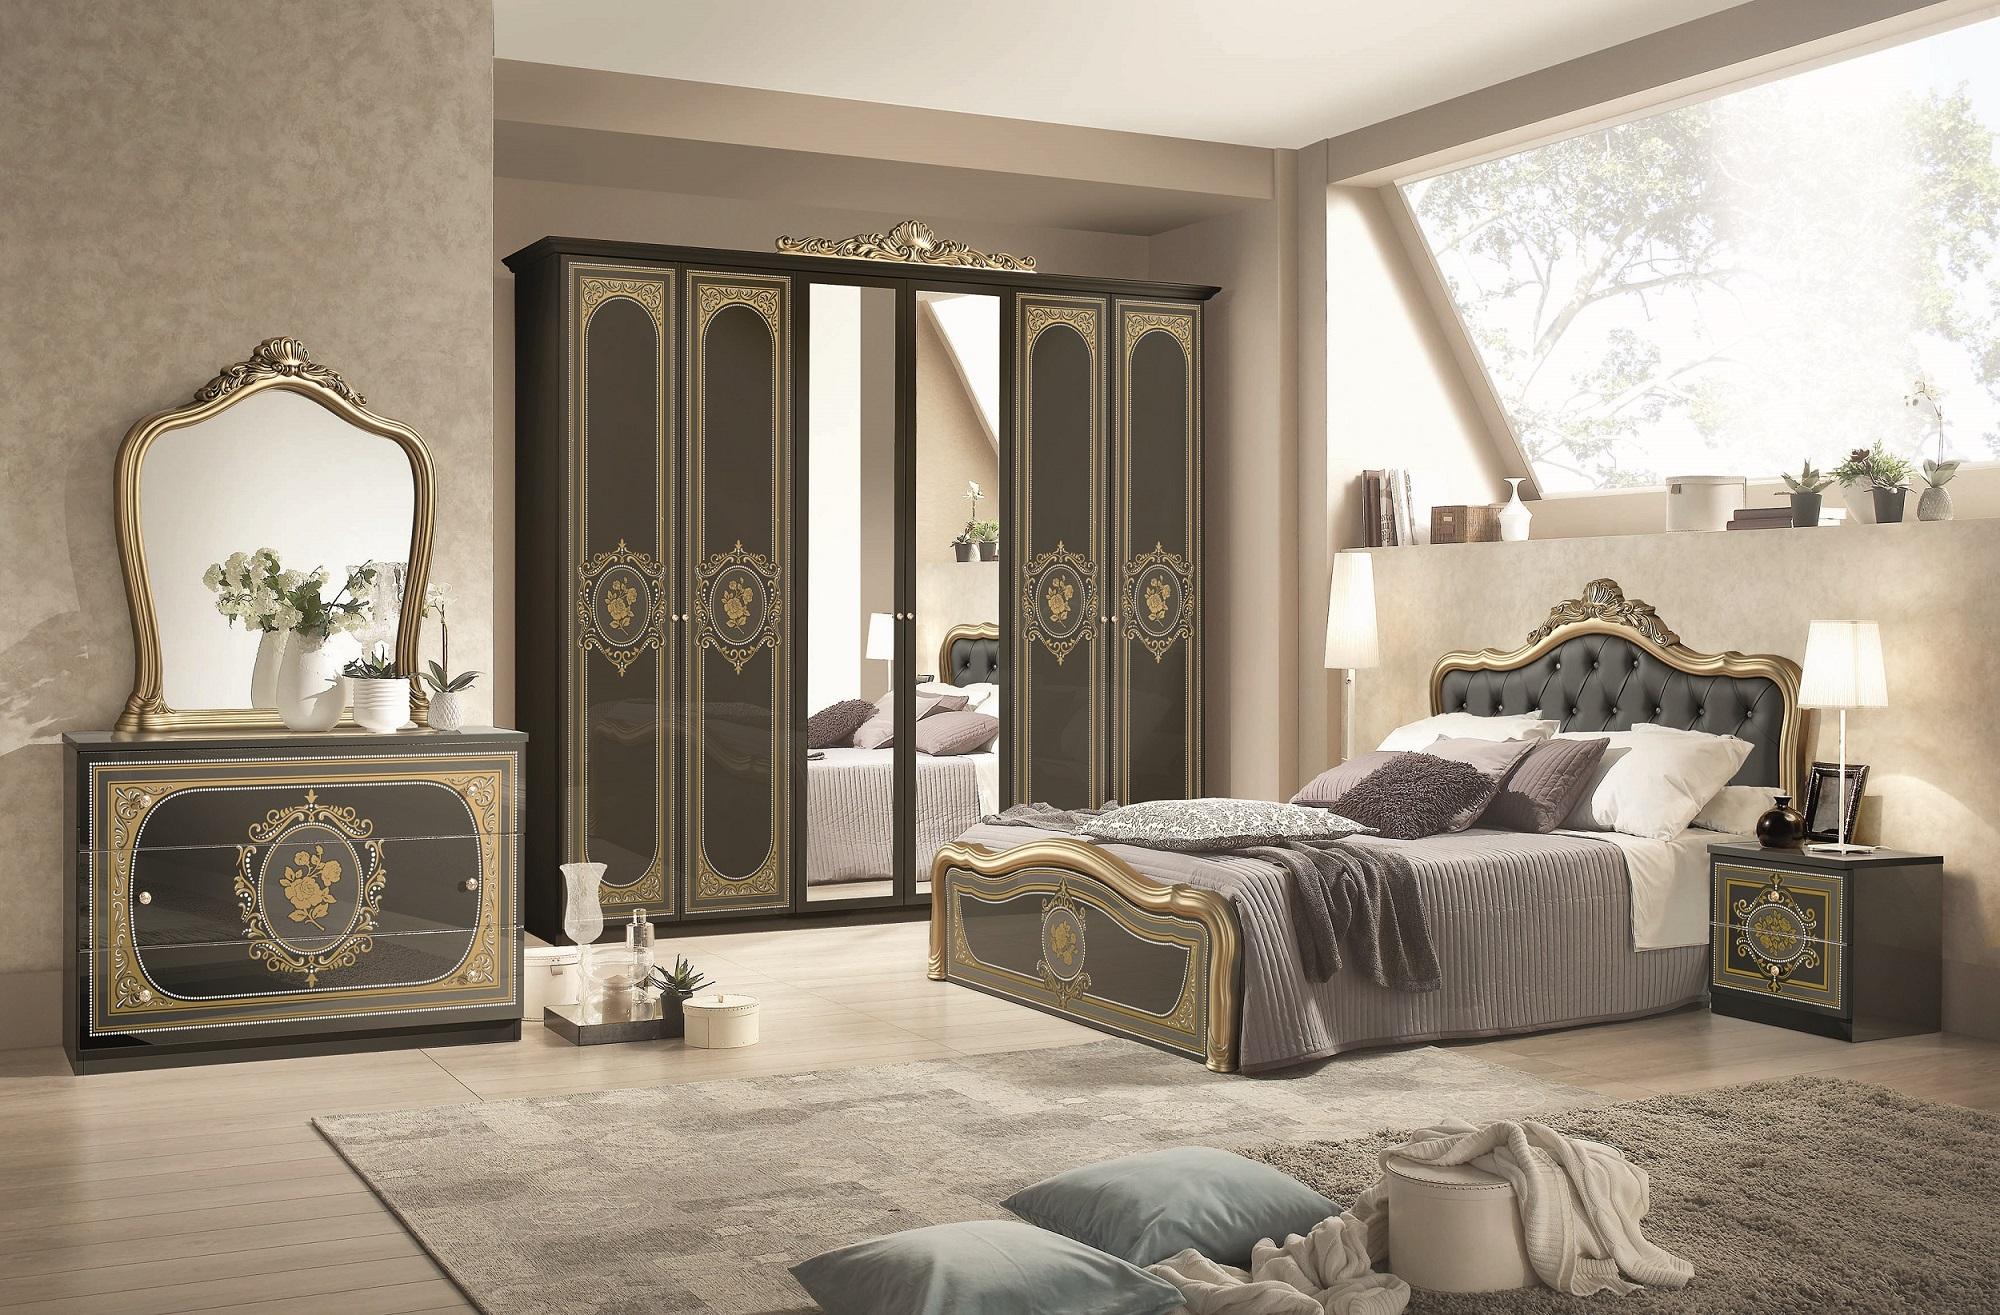 schlafzimmer alice in creme beige barock polsterung 160x200cm - Schlafzimmer Creme Beige